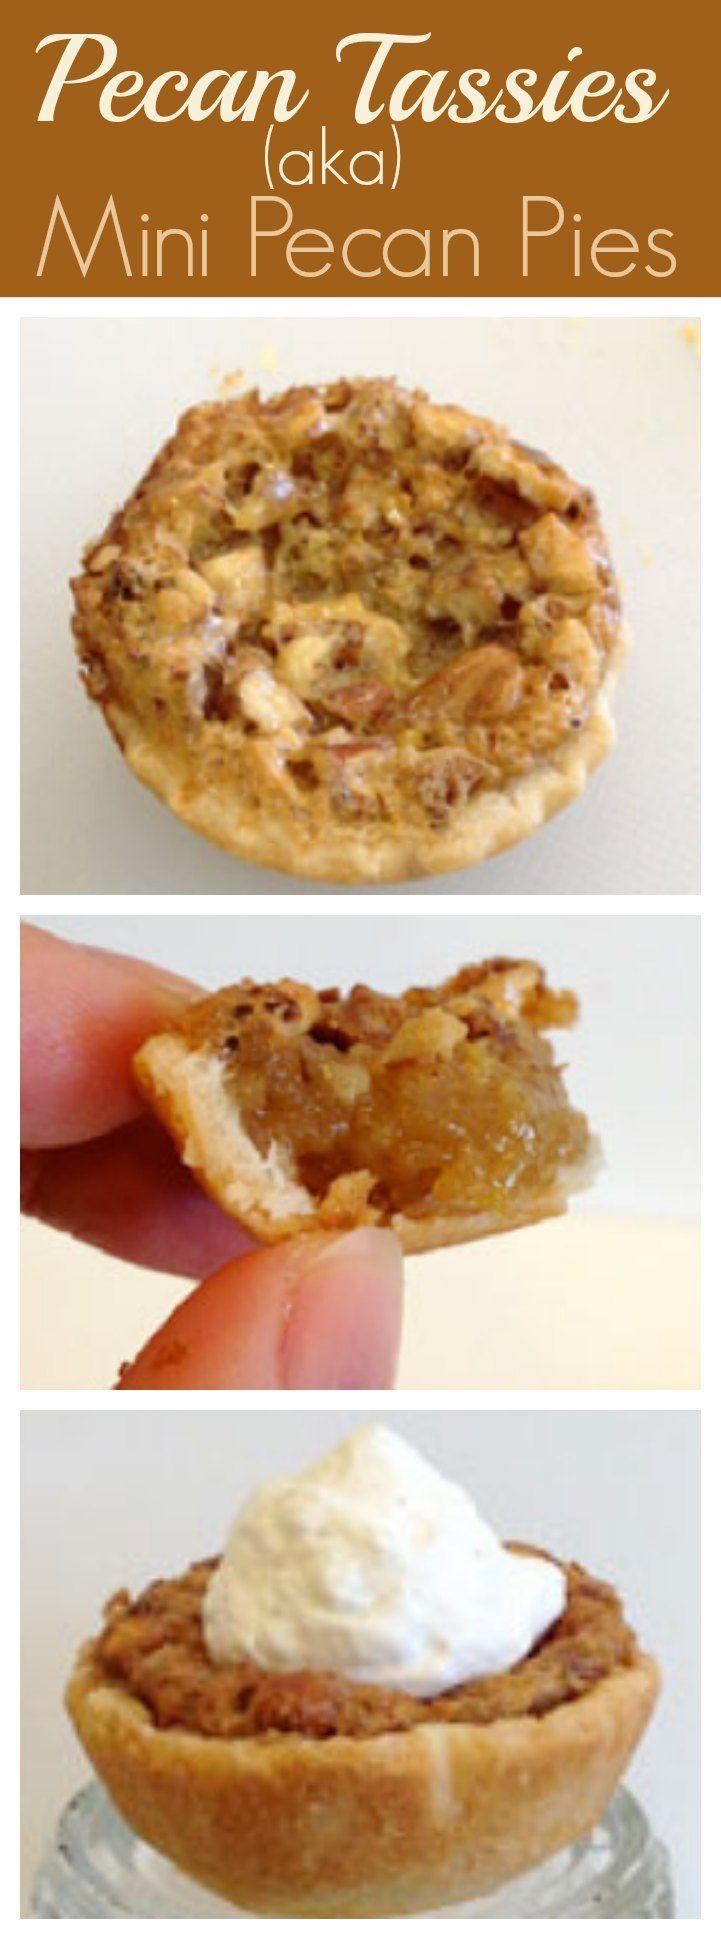 Yum!! Pecan Tassies (aka mini pecan pies) - perfect for the holiday dessert table!